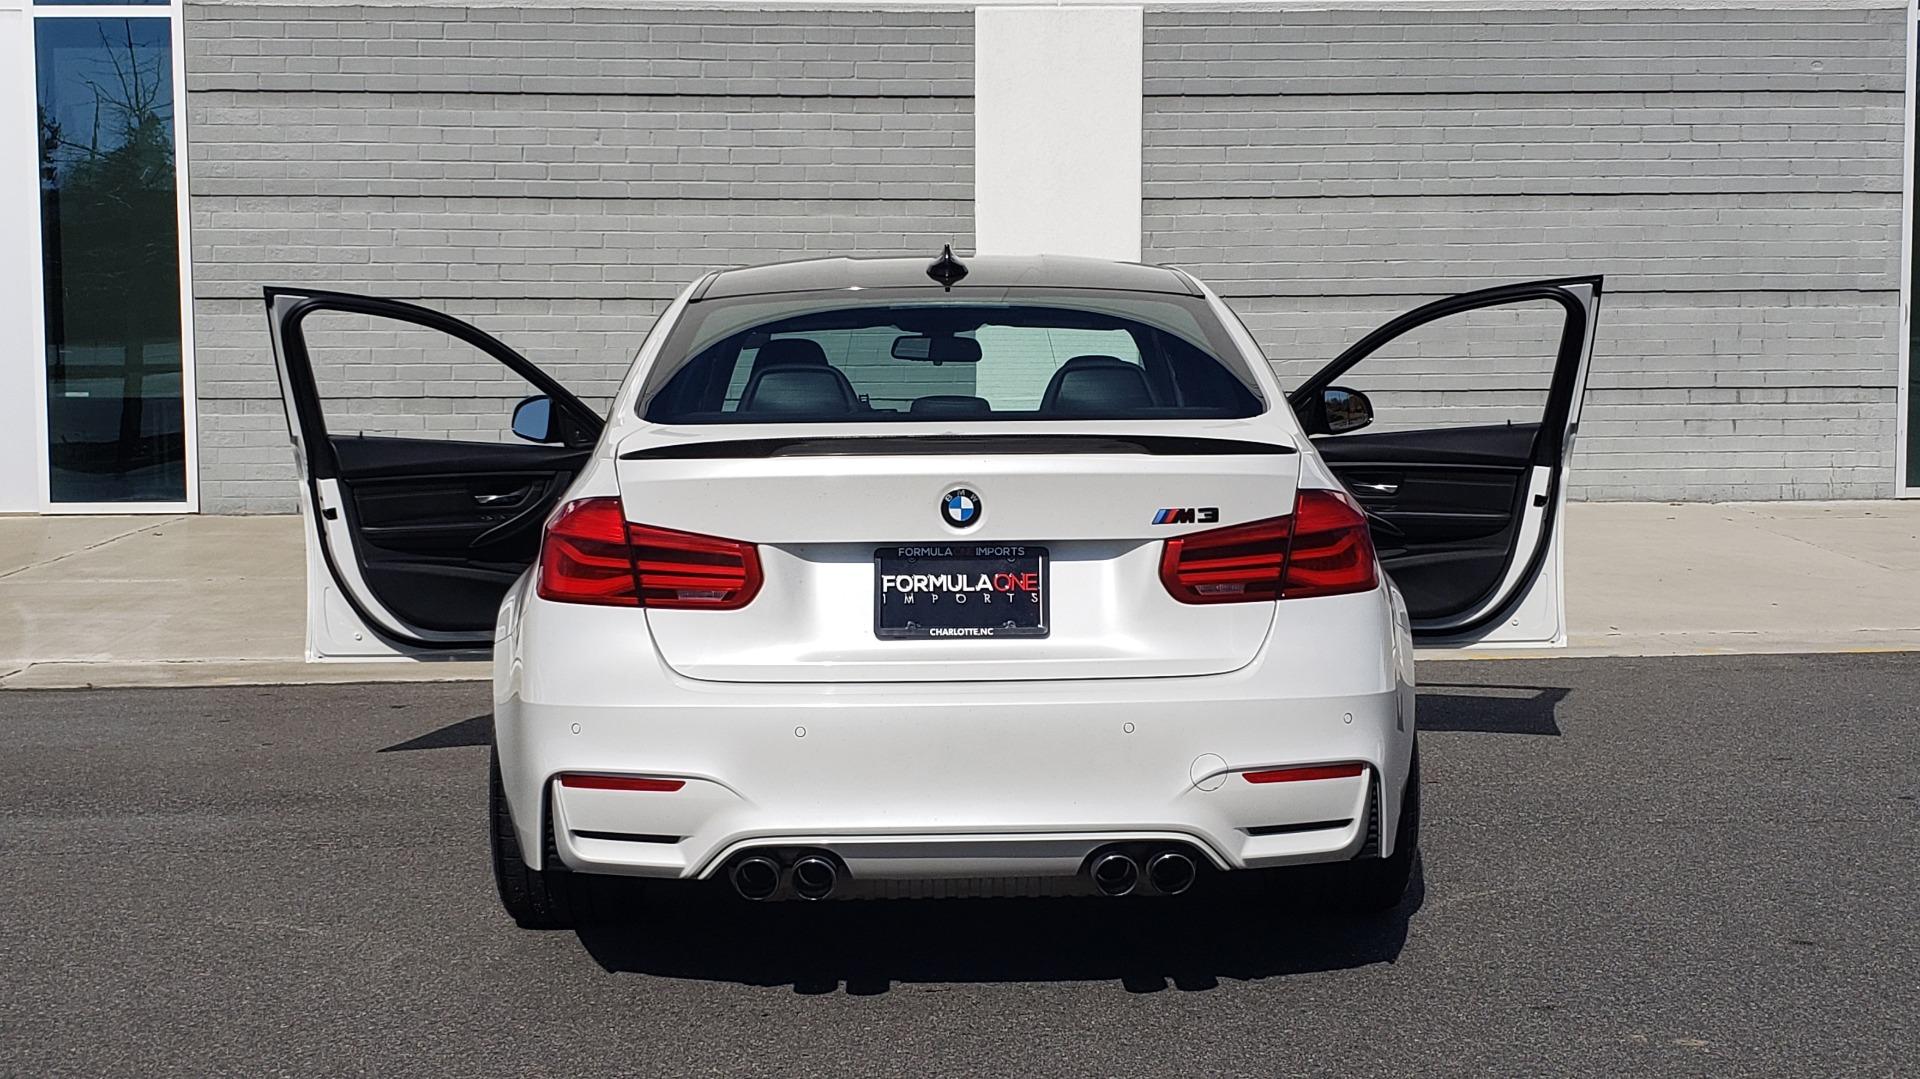 Used 2016 BMW M3 SEDAN / EXECUTIVE PKG / M-SUSPENSION / HARMAN/KARDON SOUND for sale Sold at Formula Imports in Charlotte NC 28227 31